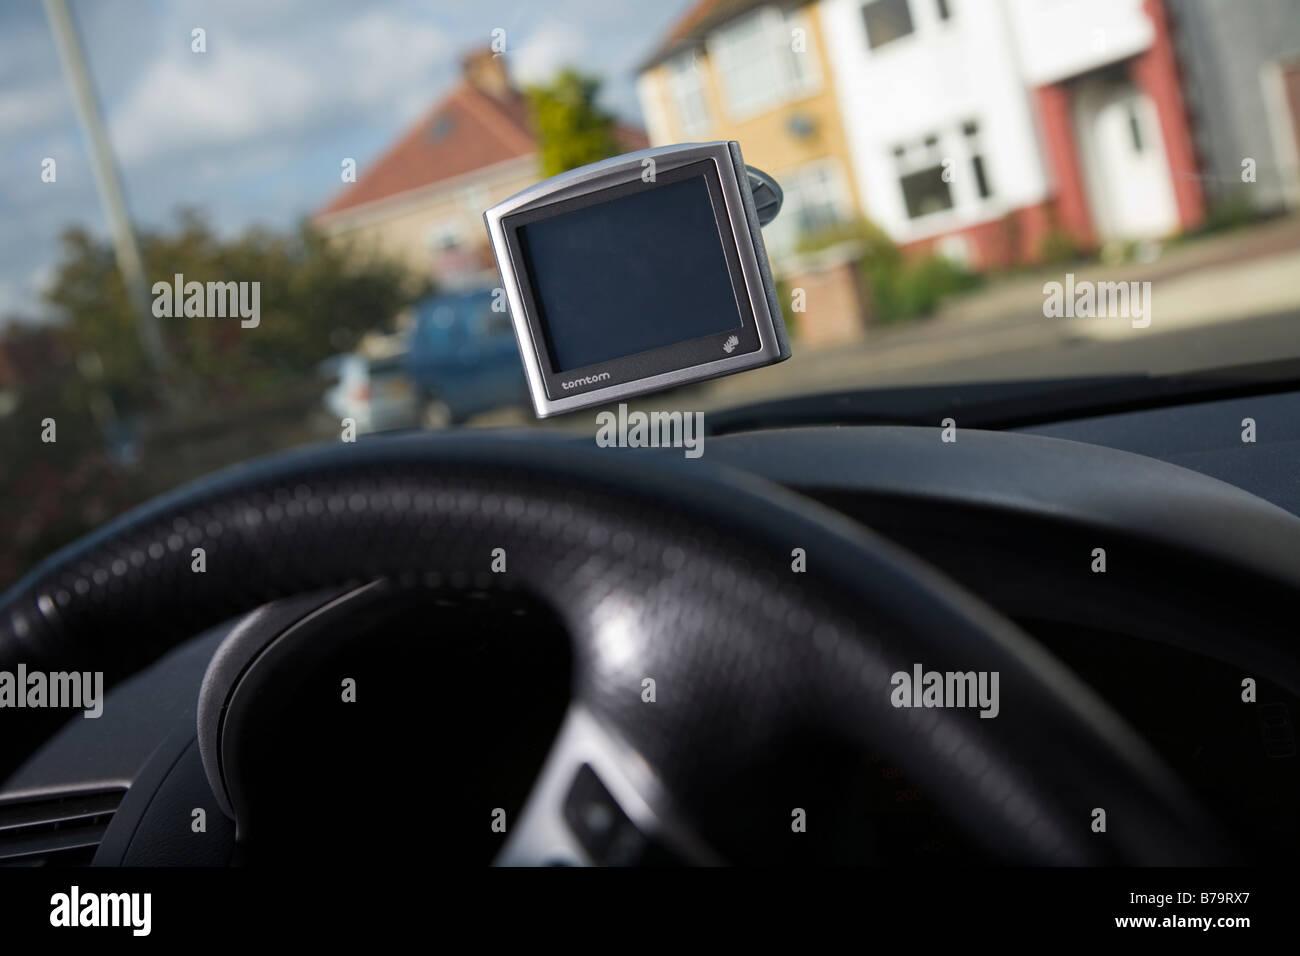 A Tom Tom satellite navigation device on a car windscreen. - Stock Image